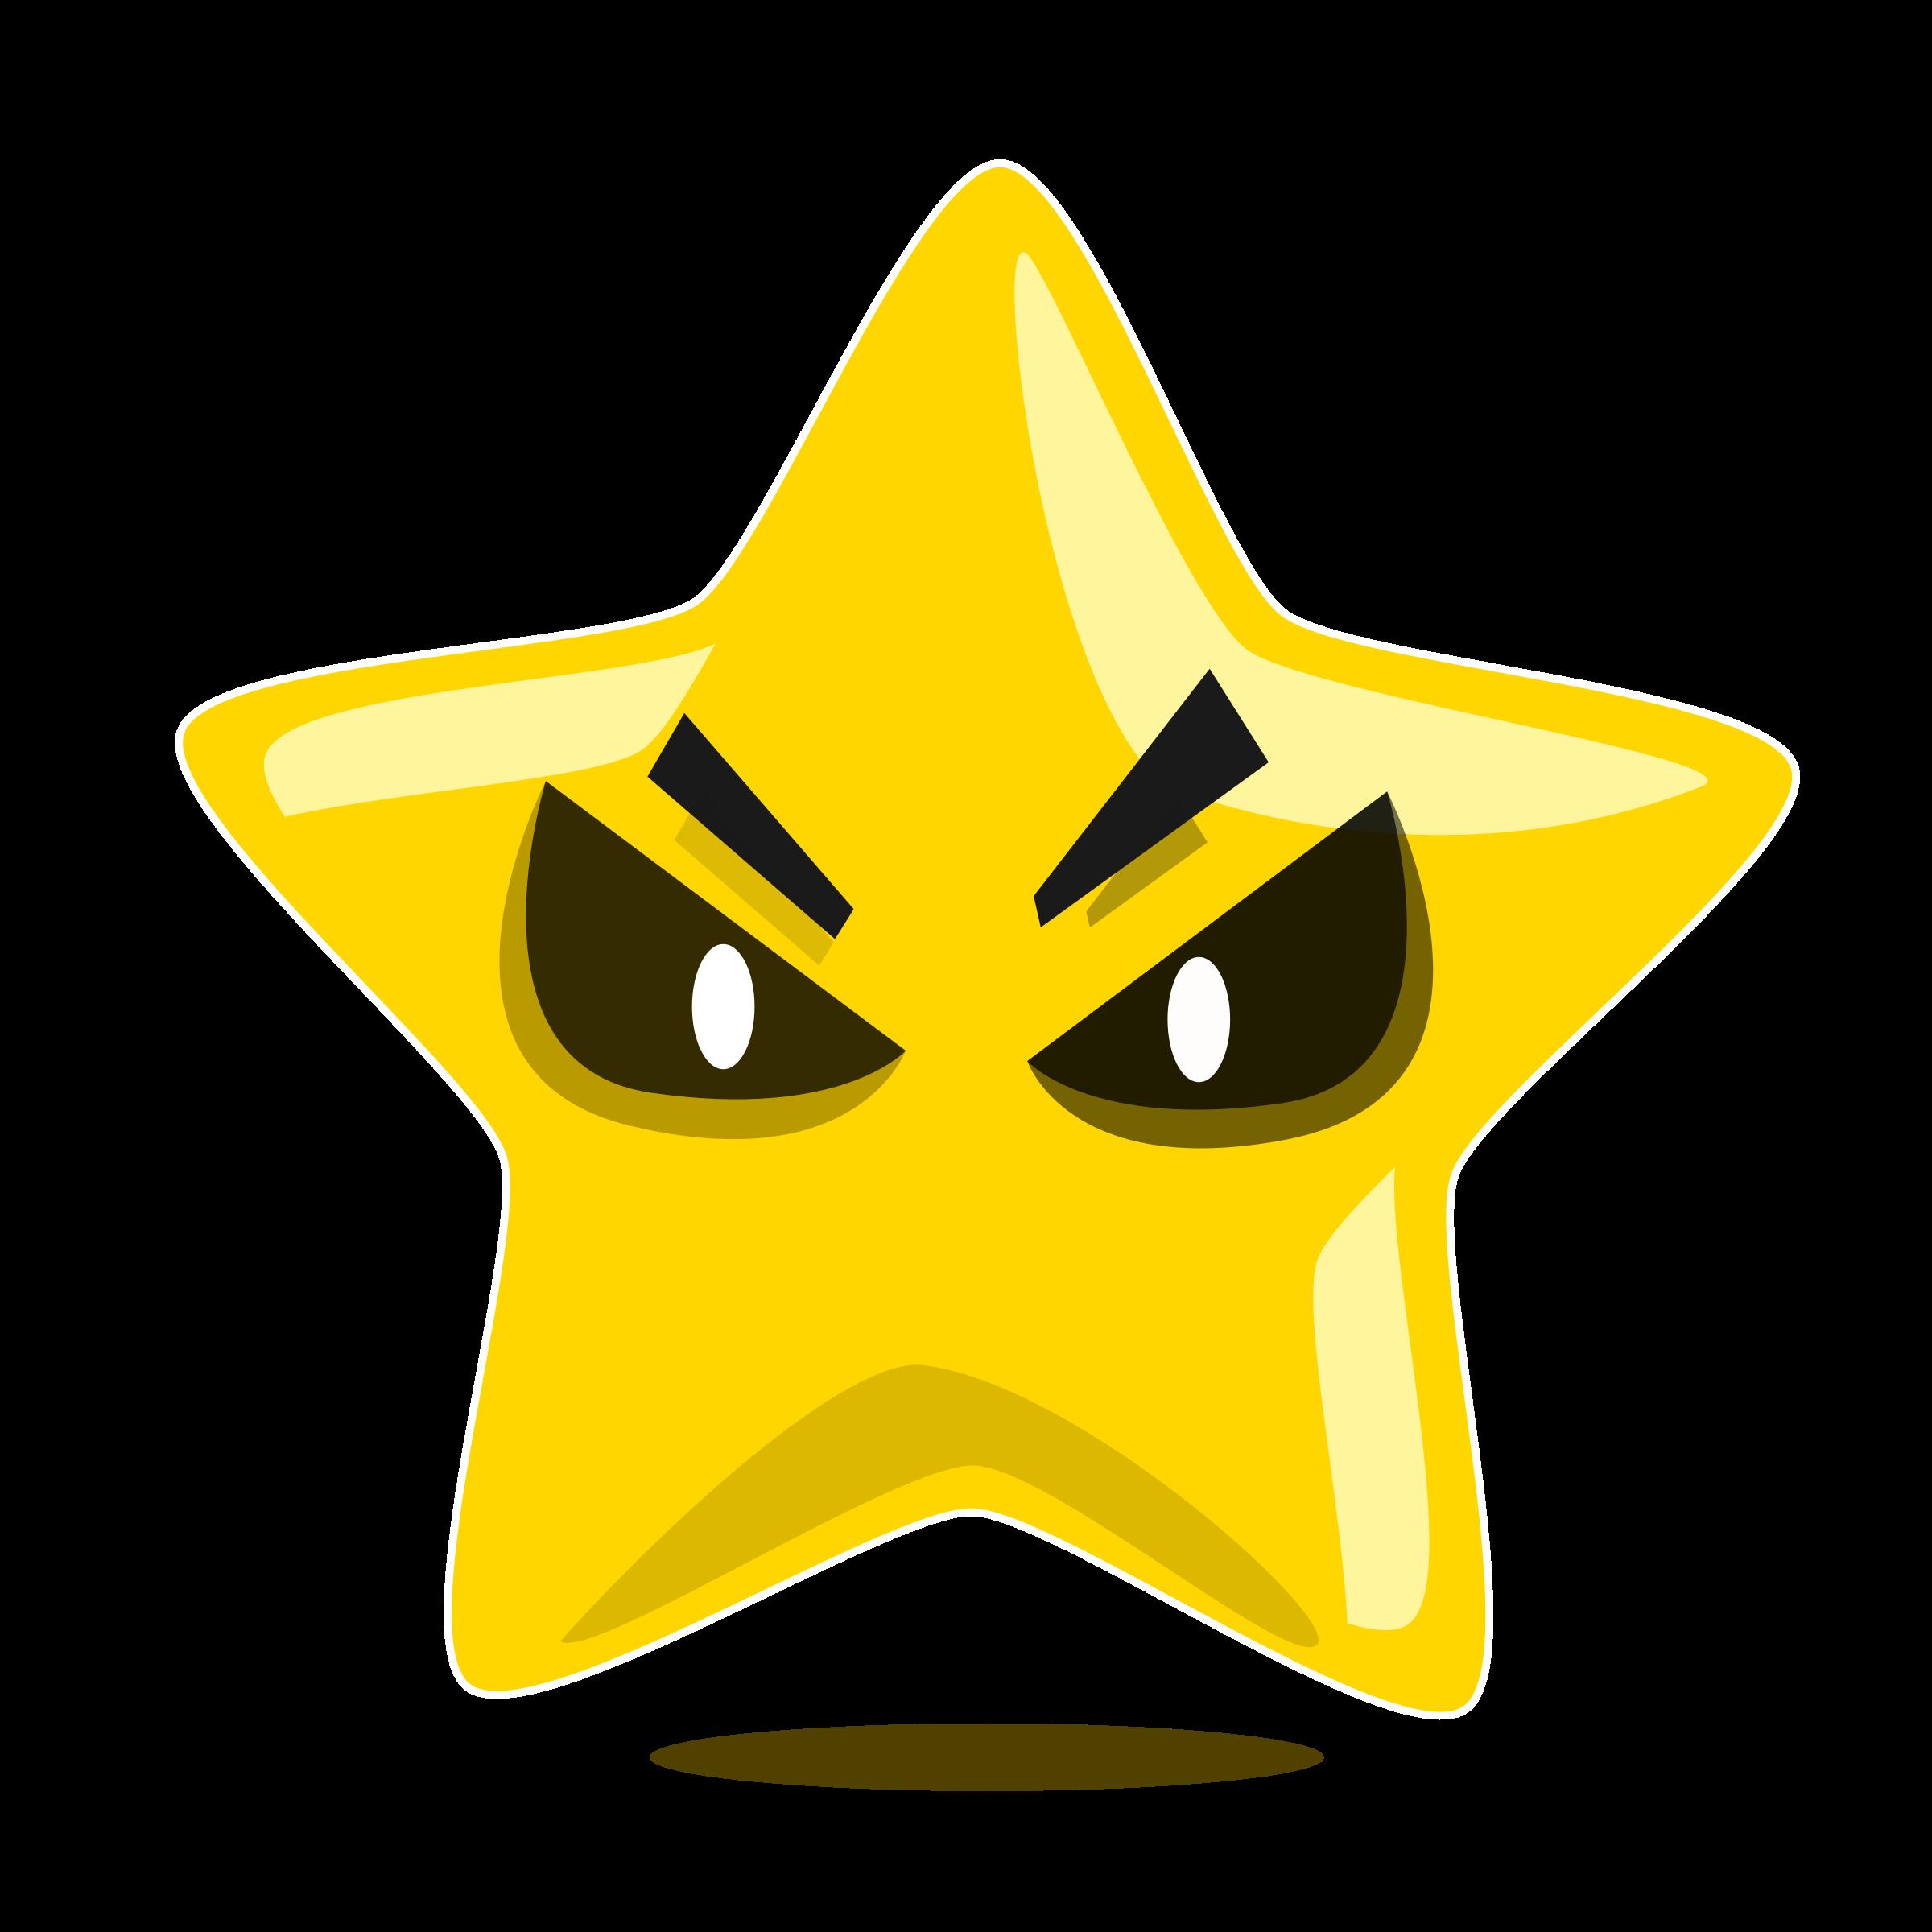 Evil character big image. Cute clipart star